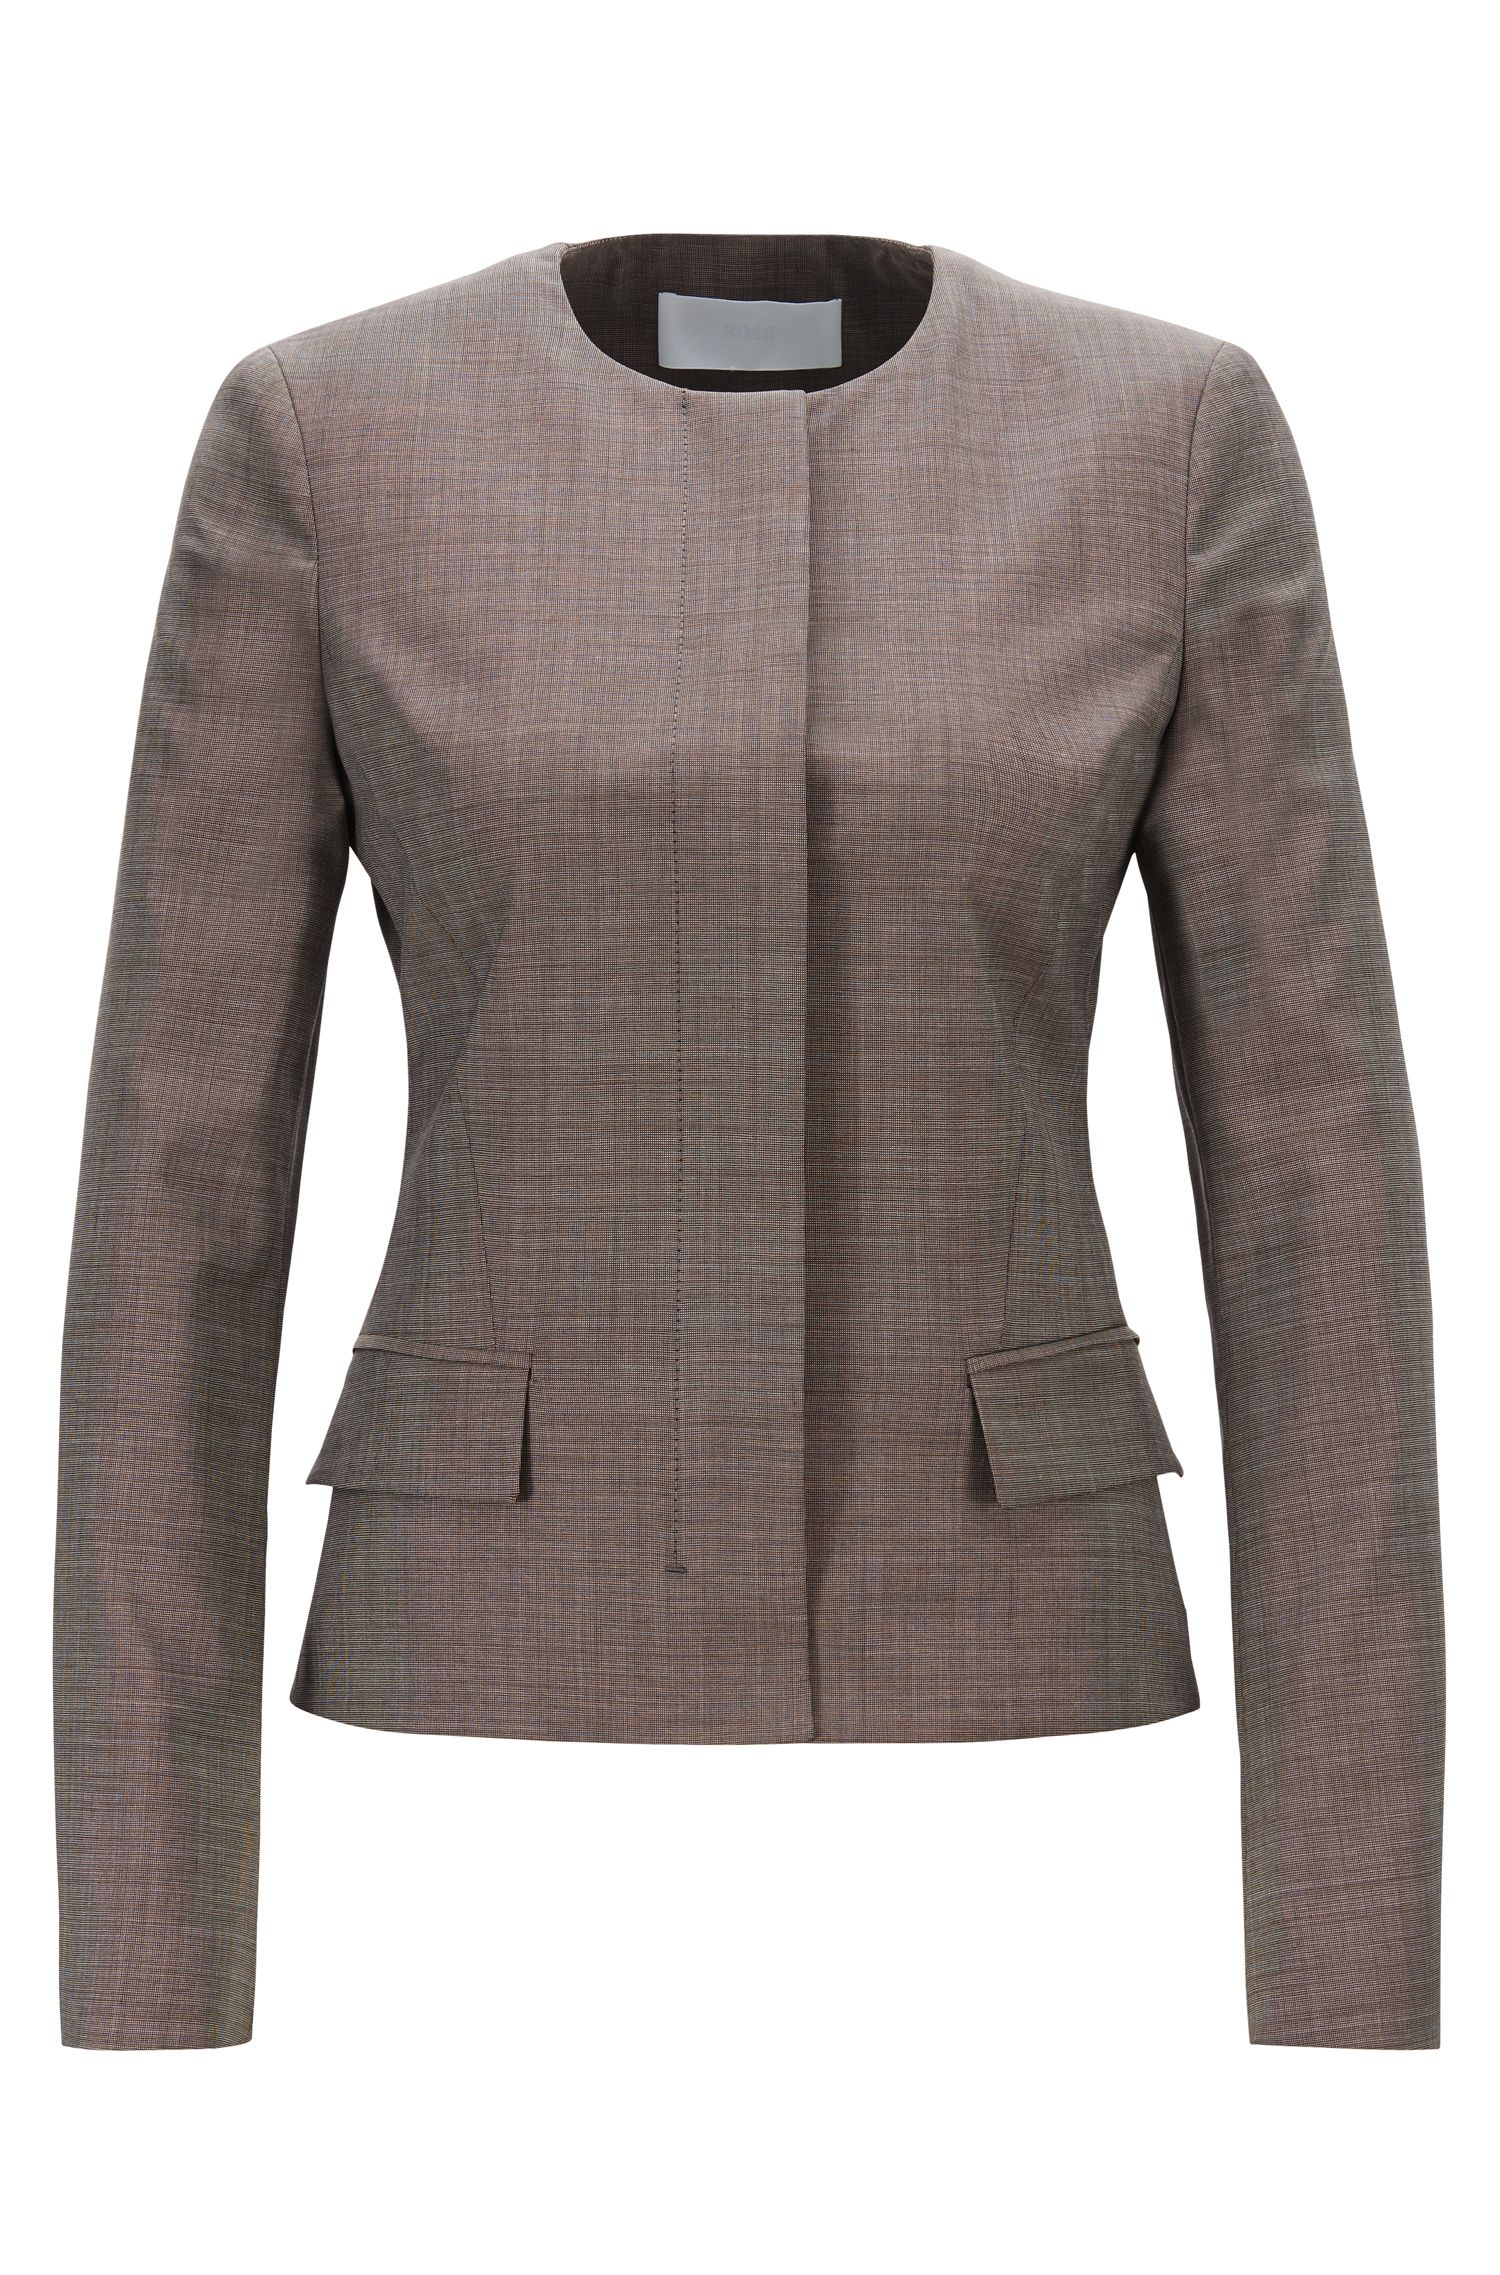 Regular-fit collarless jacket in Italian wool, Patterned